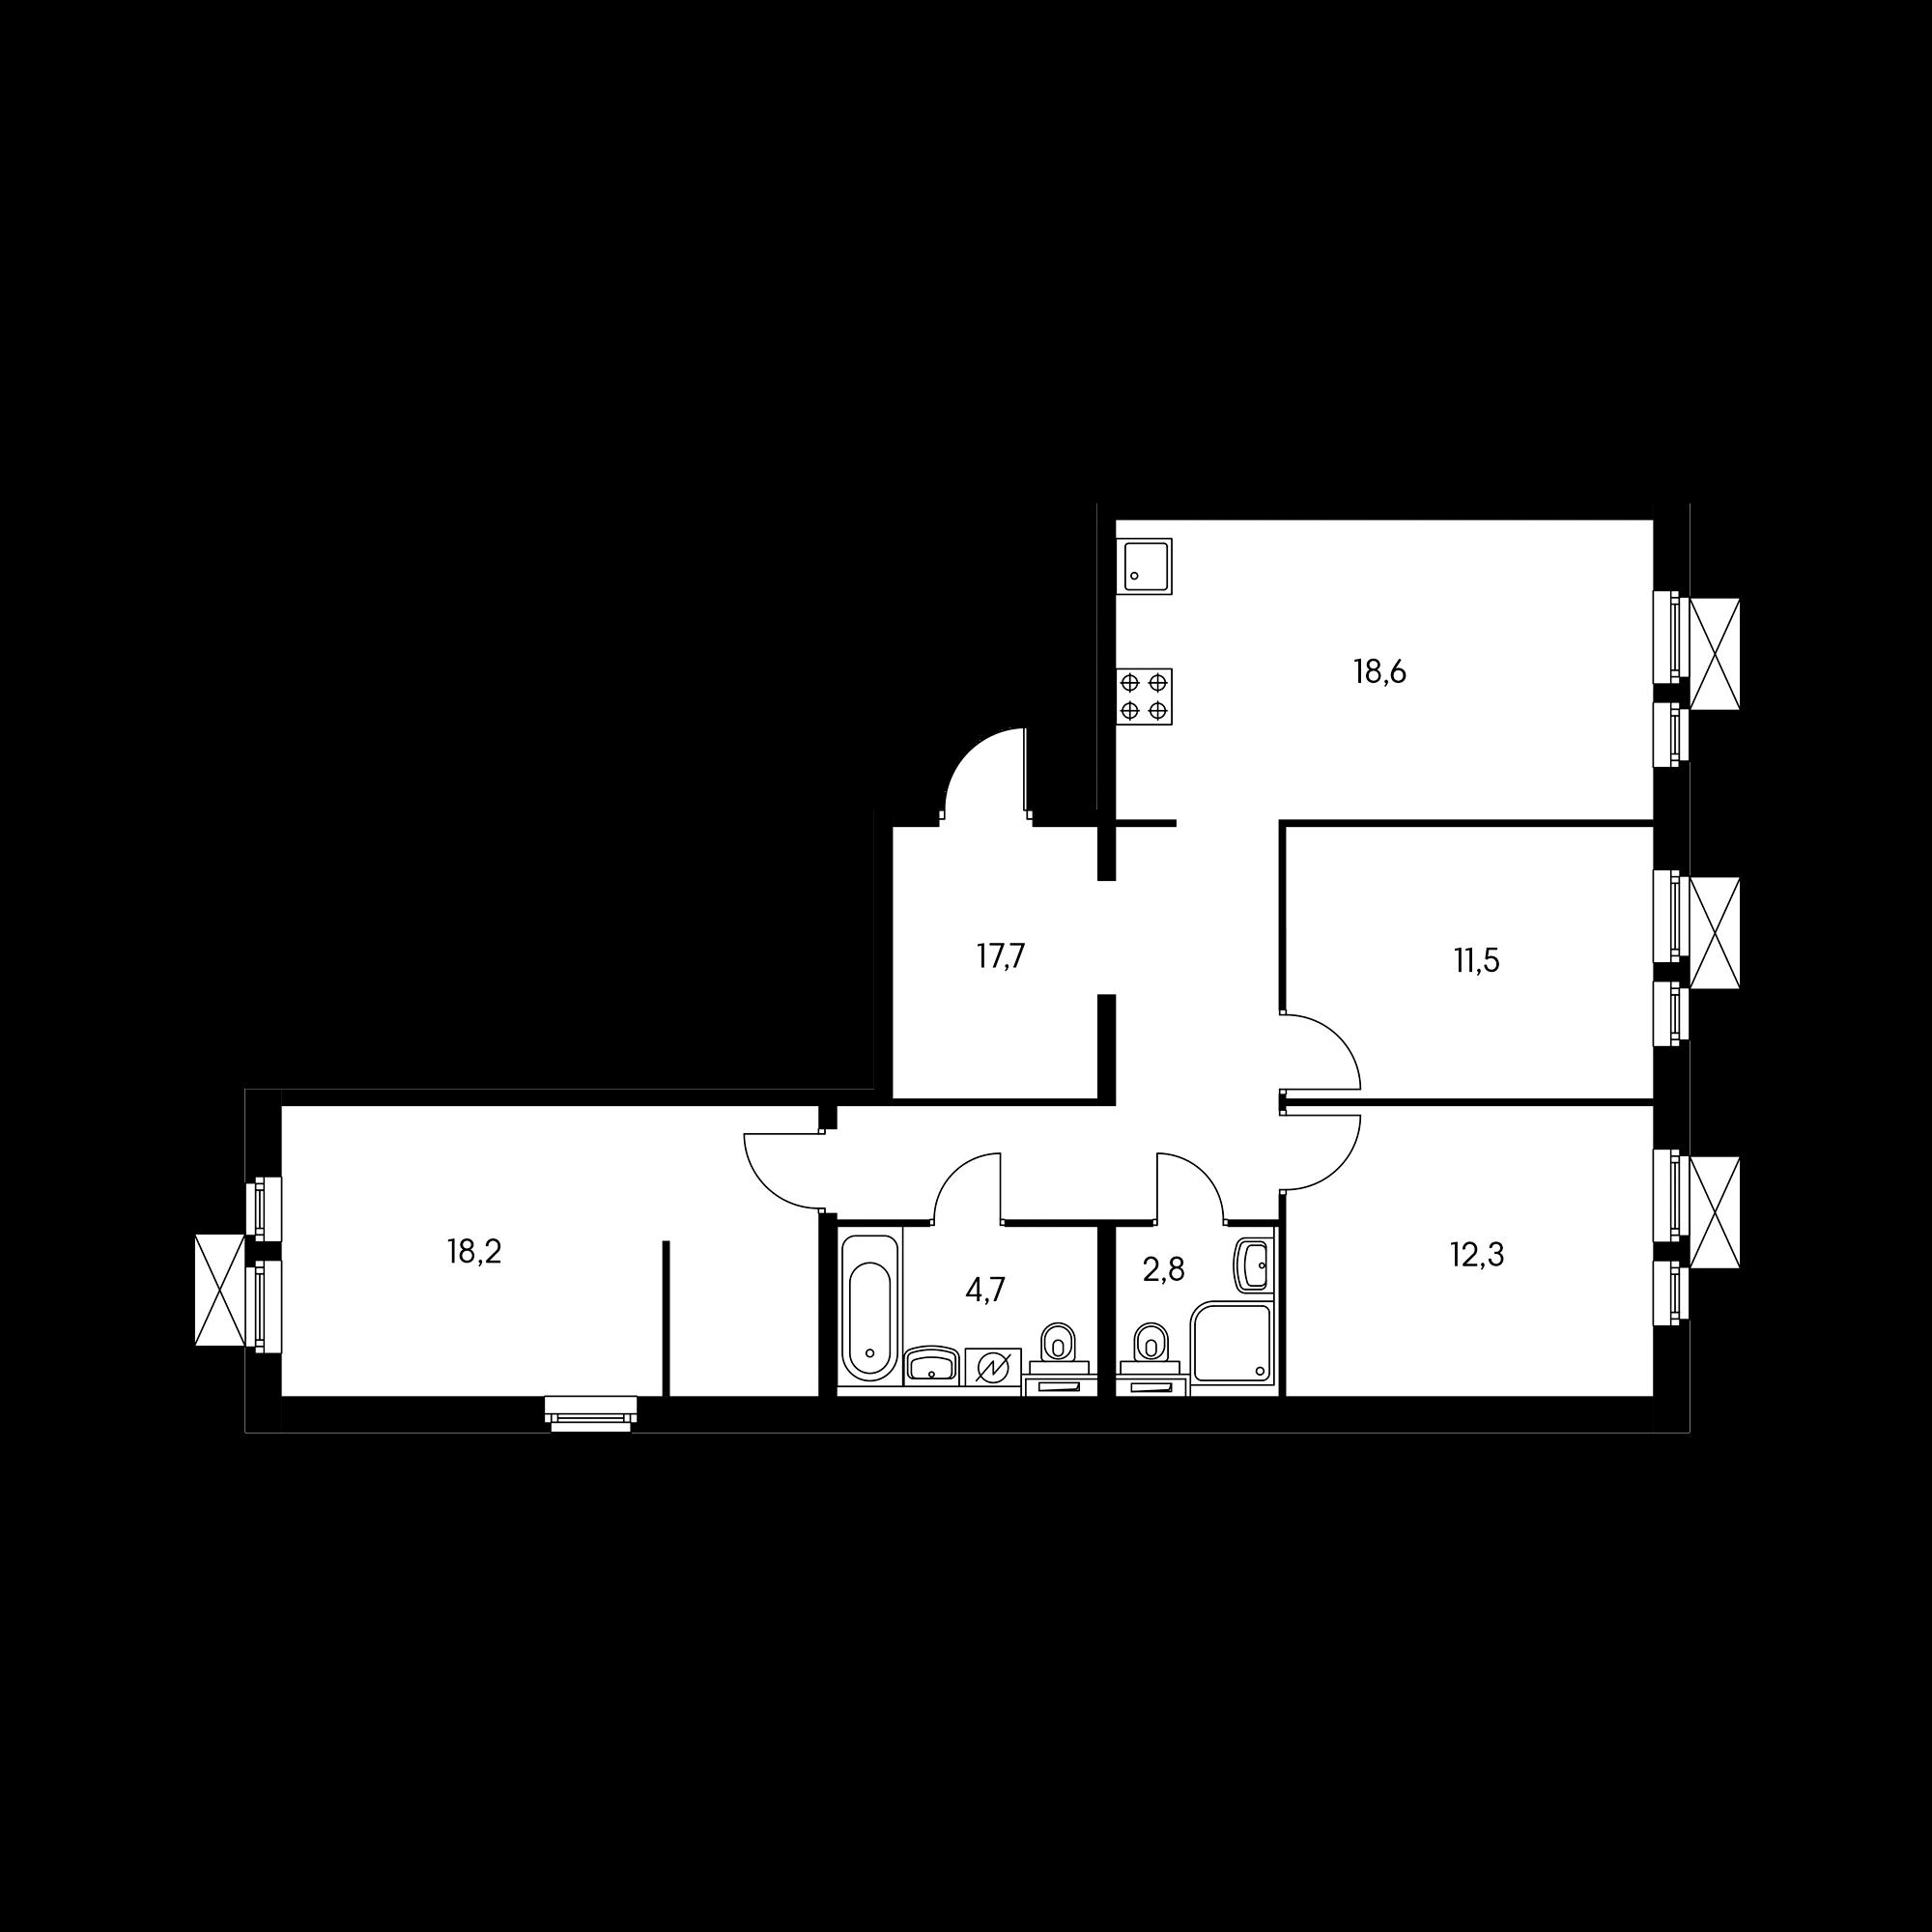 3EL3_9.6_-1